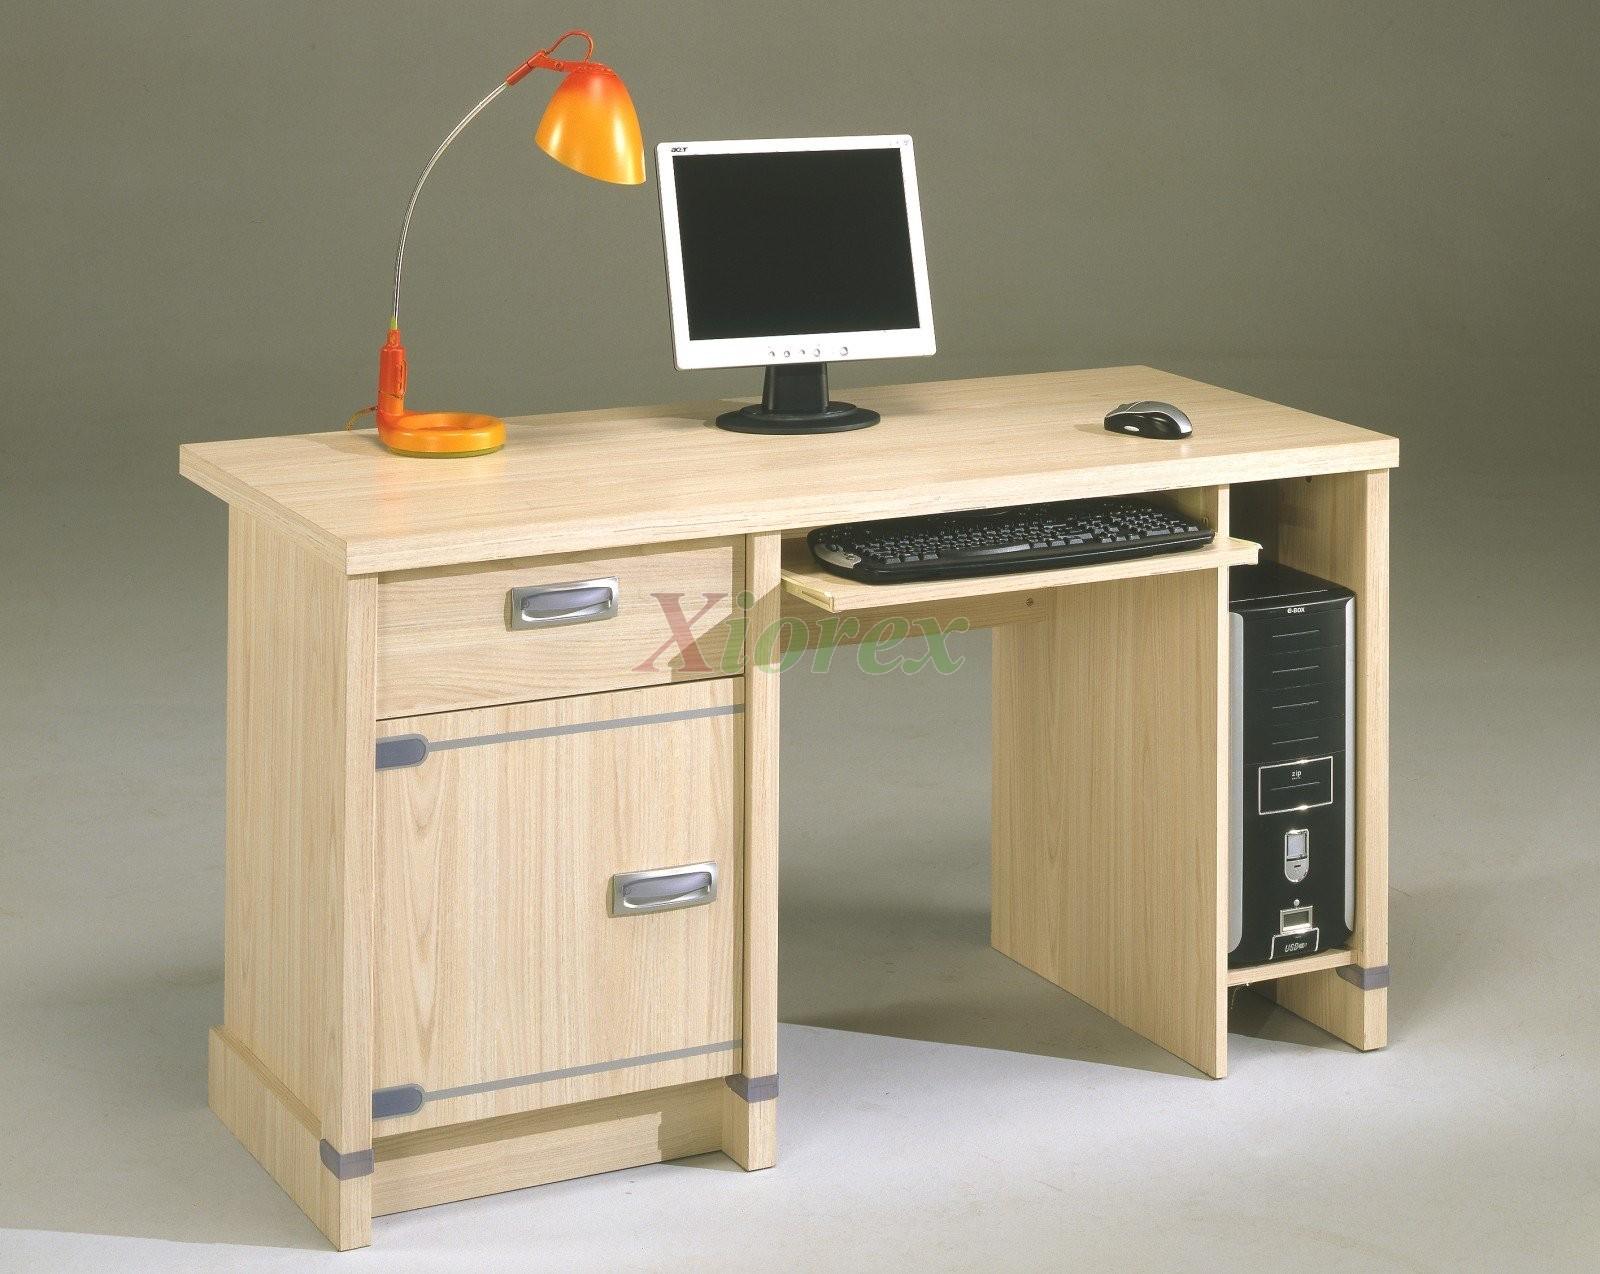 Student Desk Gami Skipper Computer For Collection Xiorex